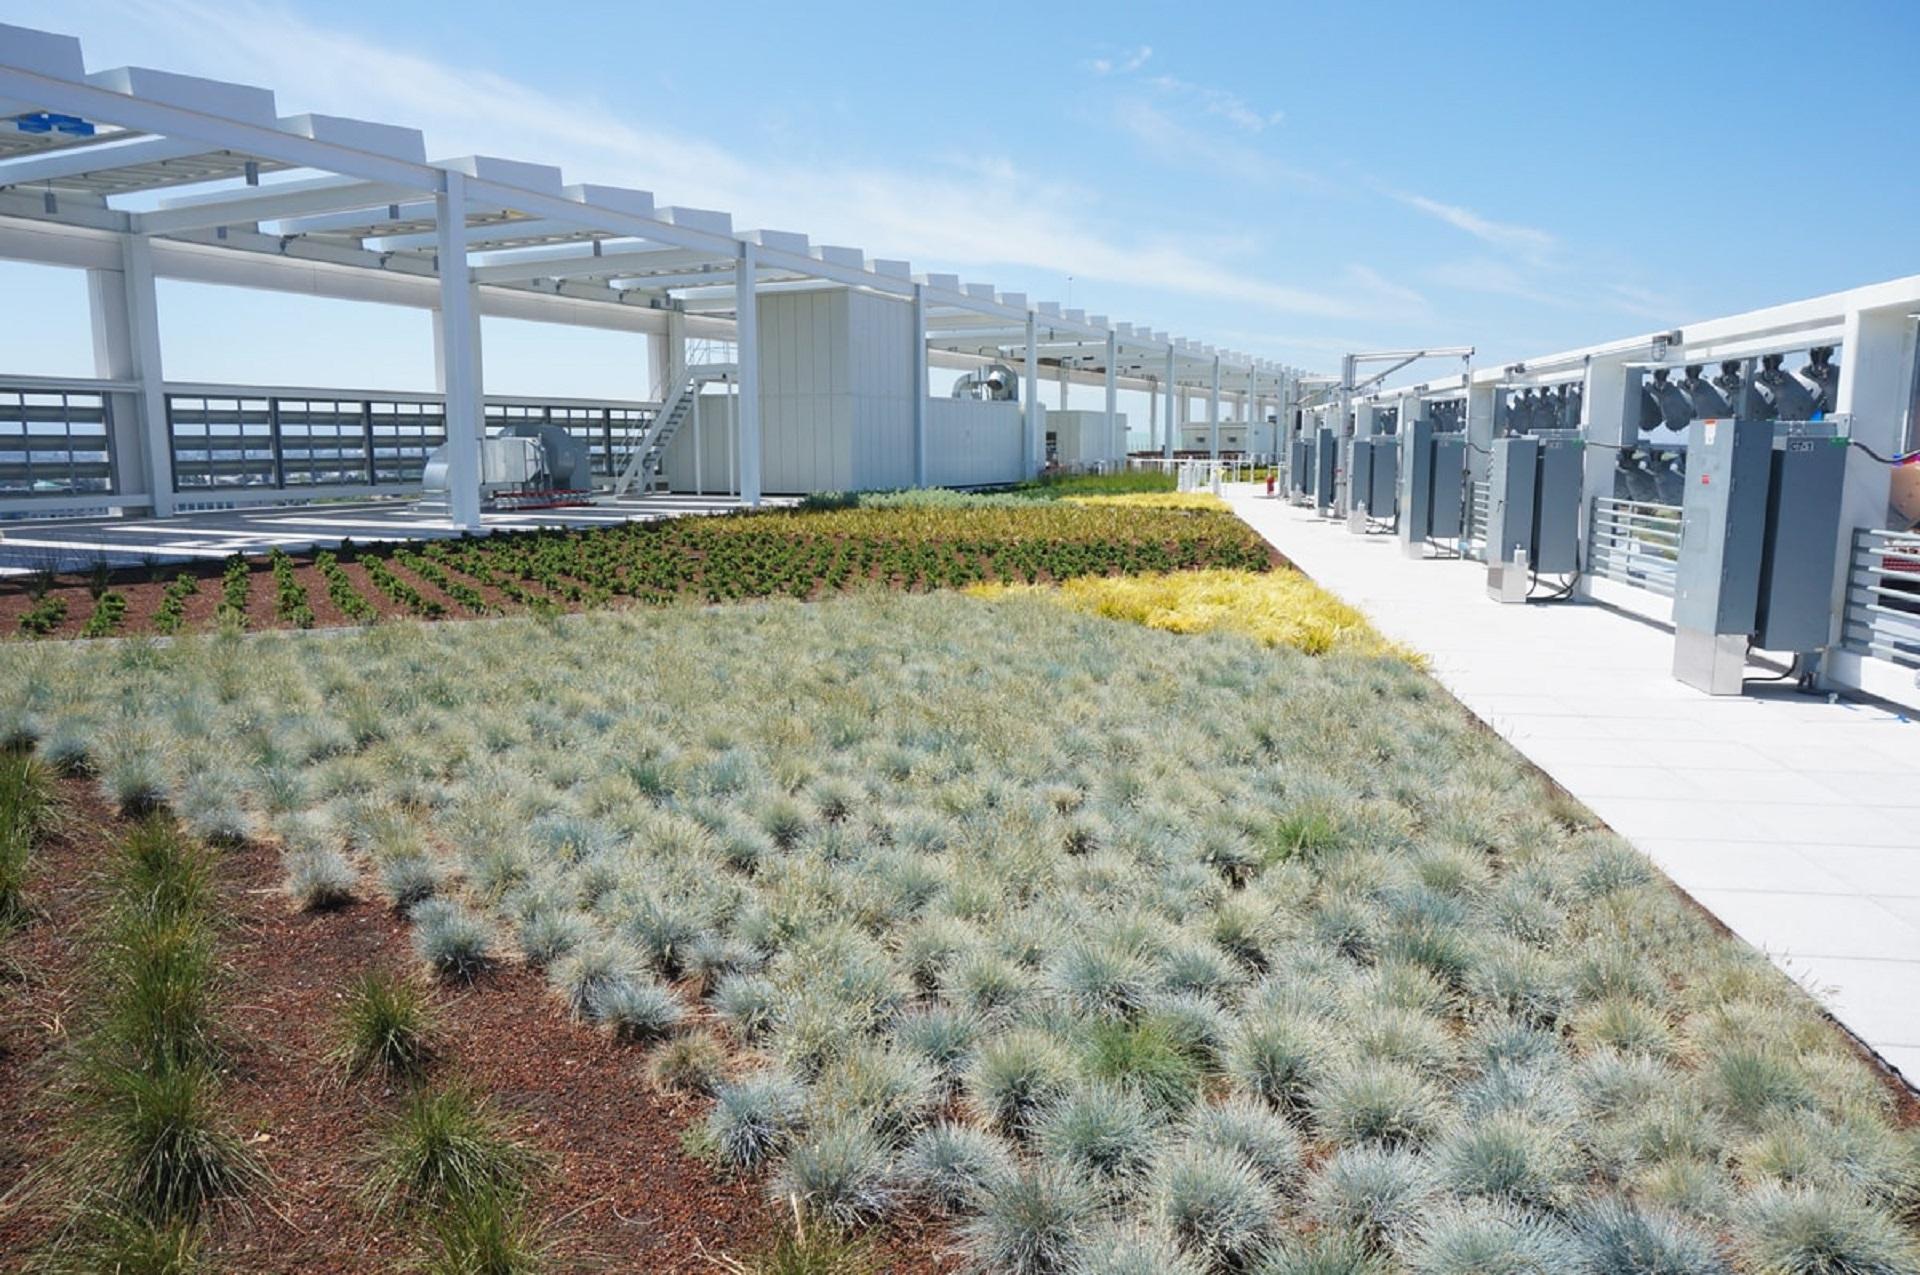 Carrefour arredo giardino 2017 progetti architettonici for Arredo giardino carrefour